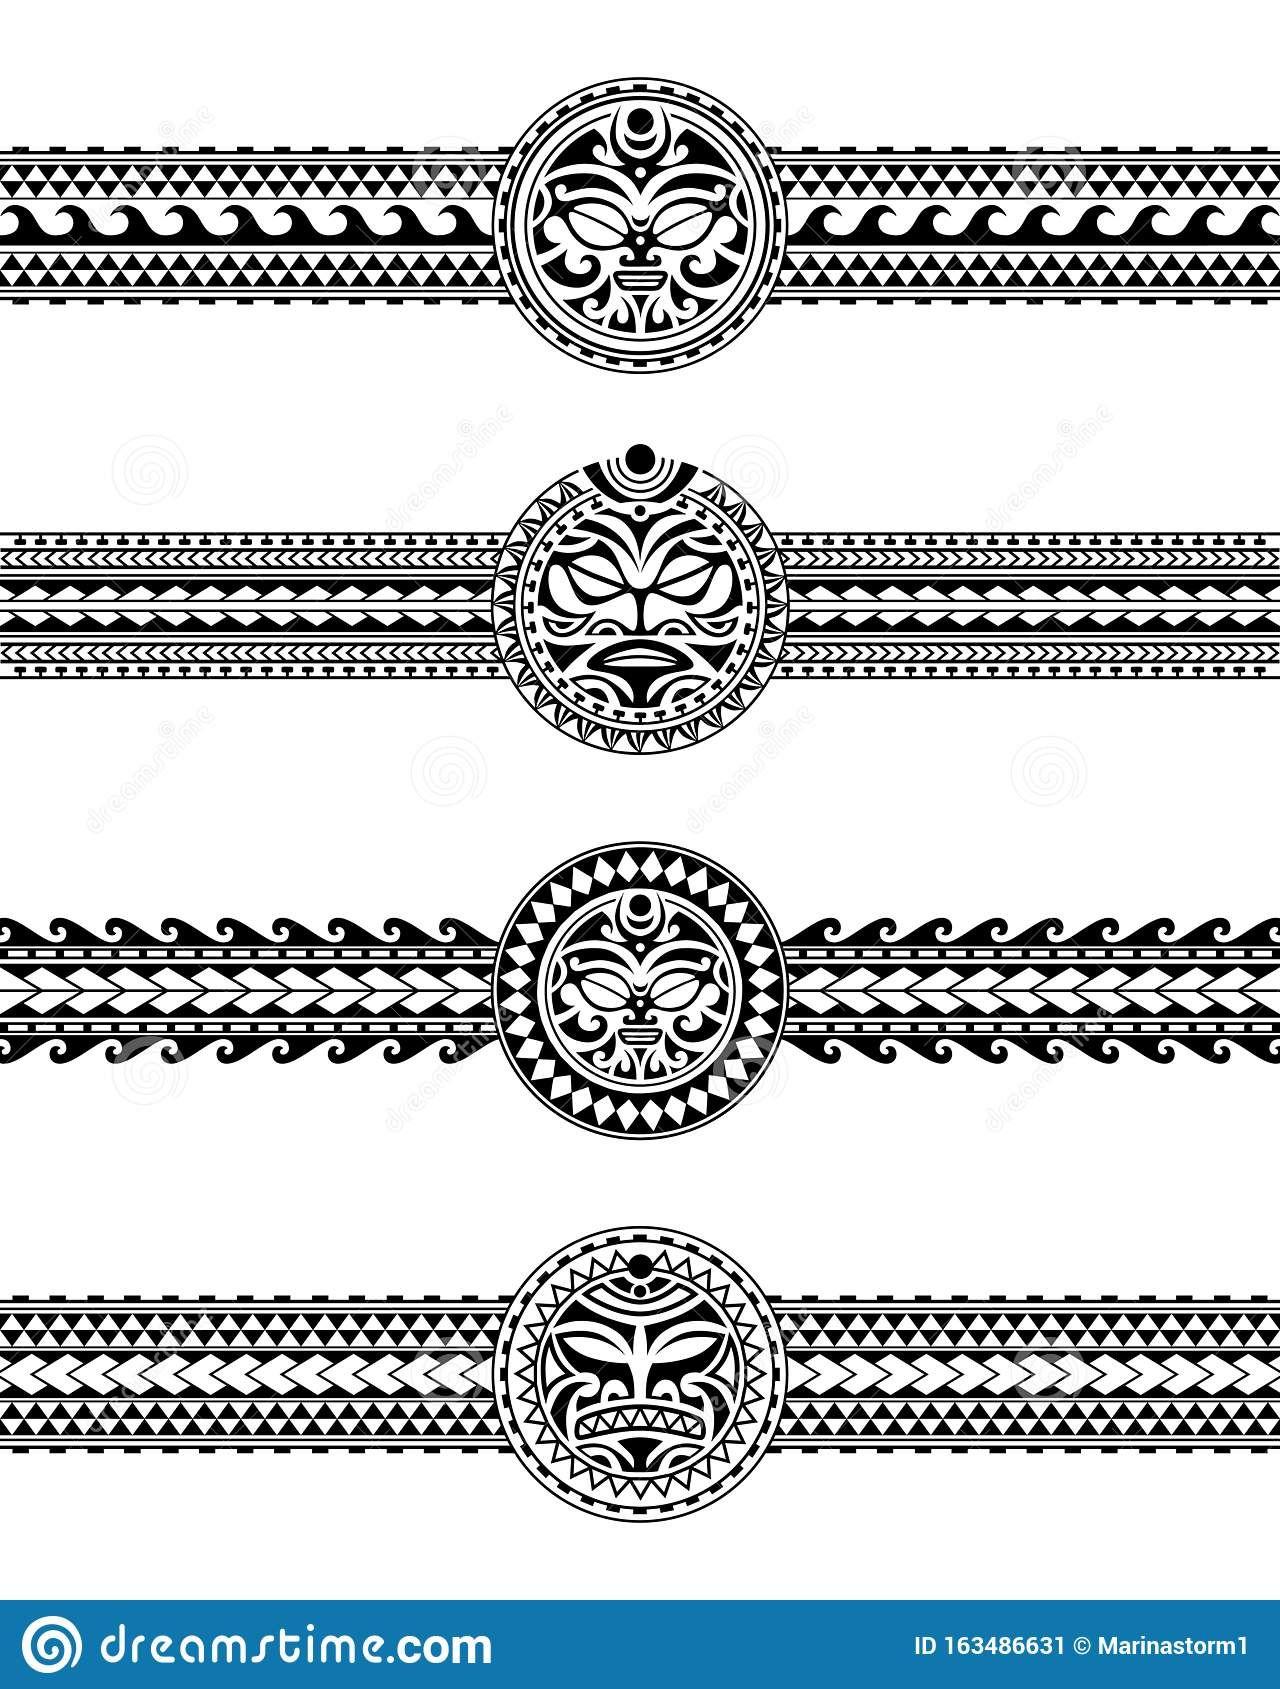 Illustration About Set Of Maori Polynesian Tattoo Border Tribal Sleeve Pattern Vector Samoan Bracele In 2020 Band Tattoo Designs Tattoo Bracelet Tribal Armband Tattoo